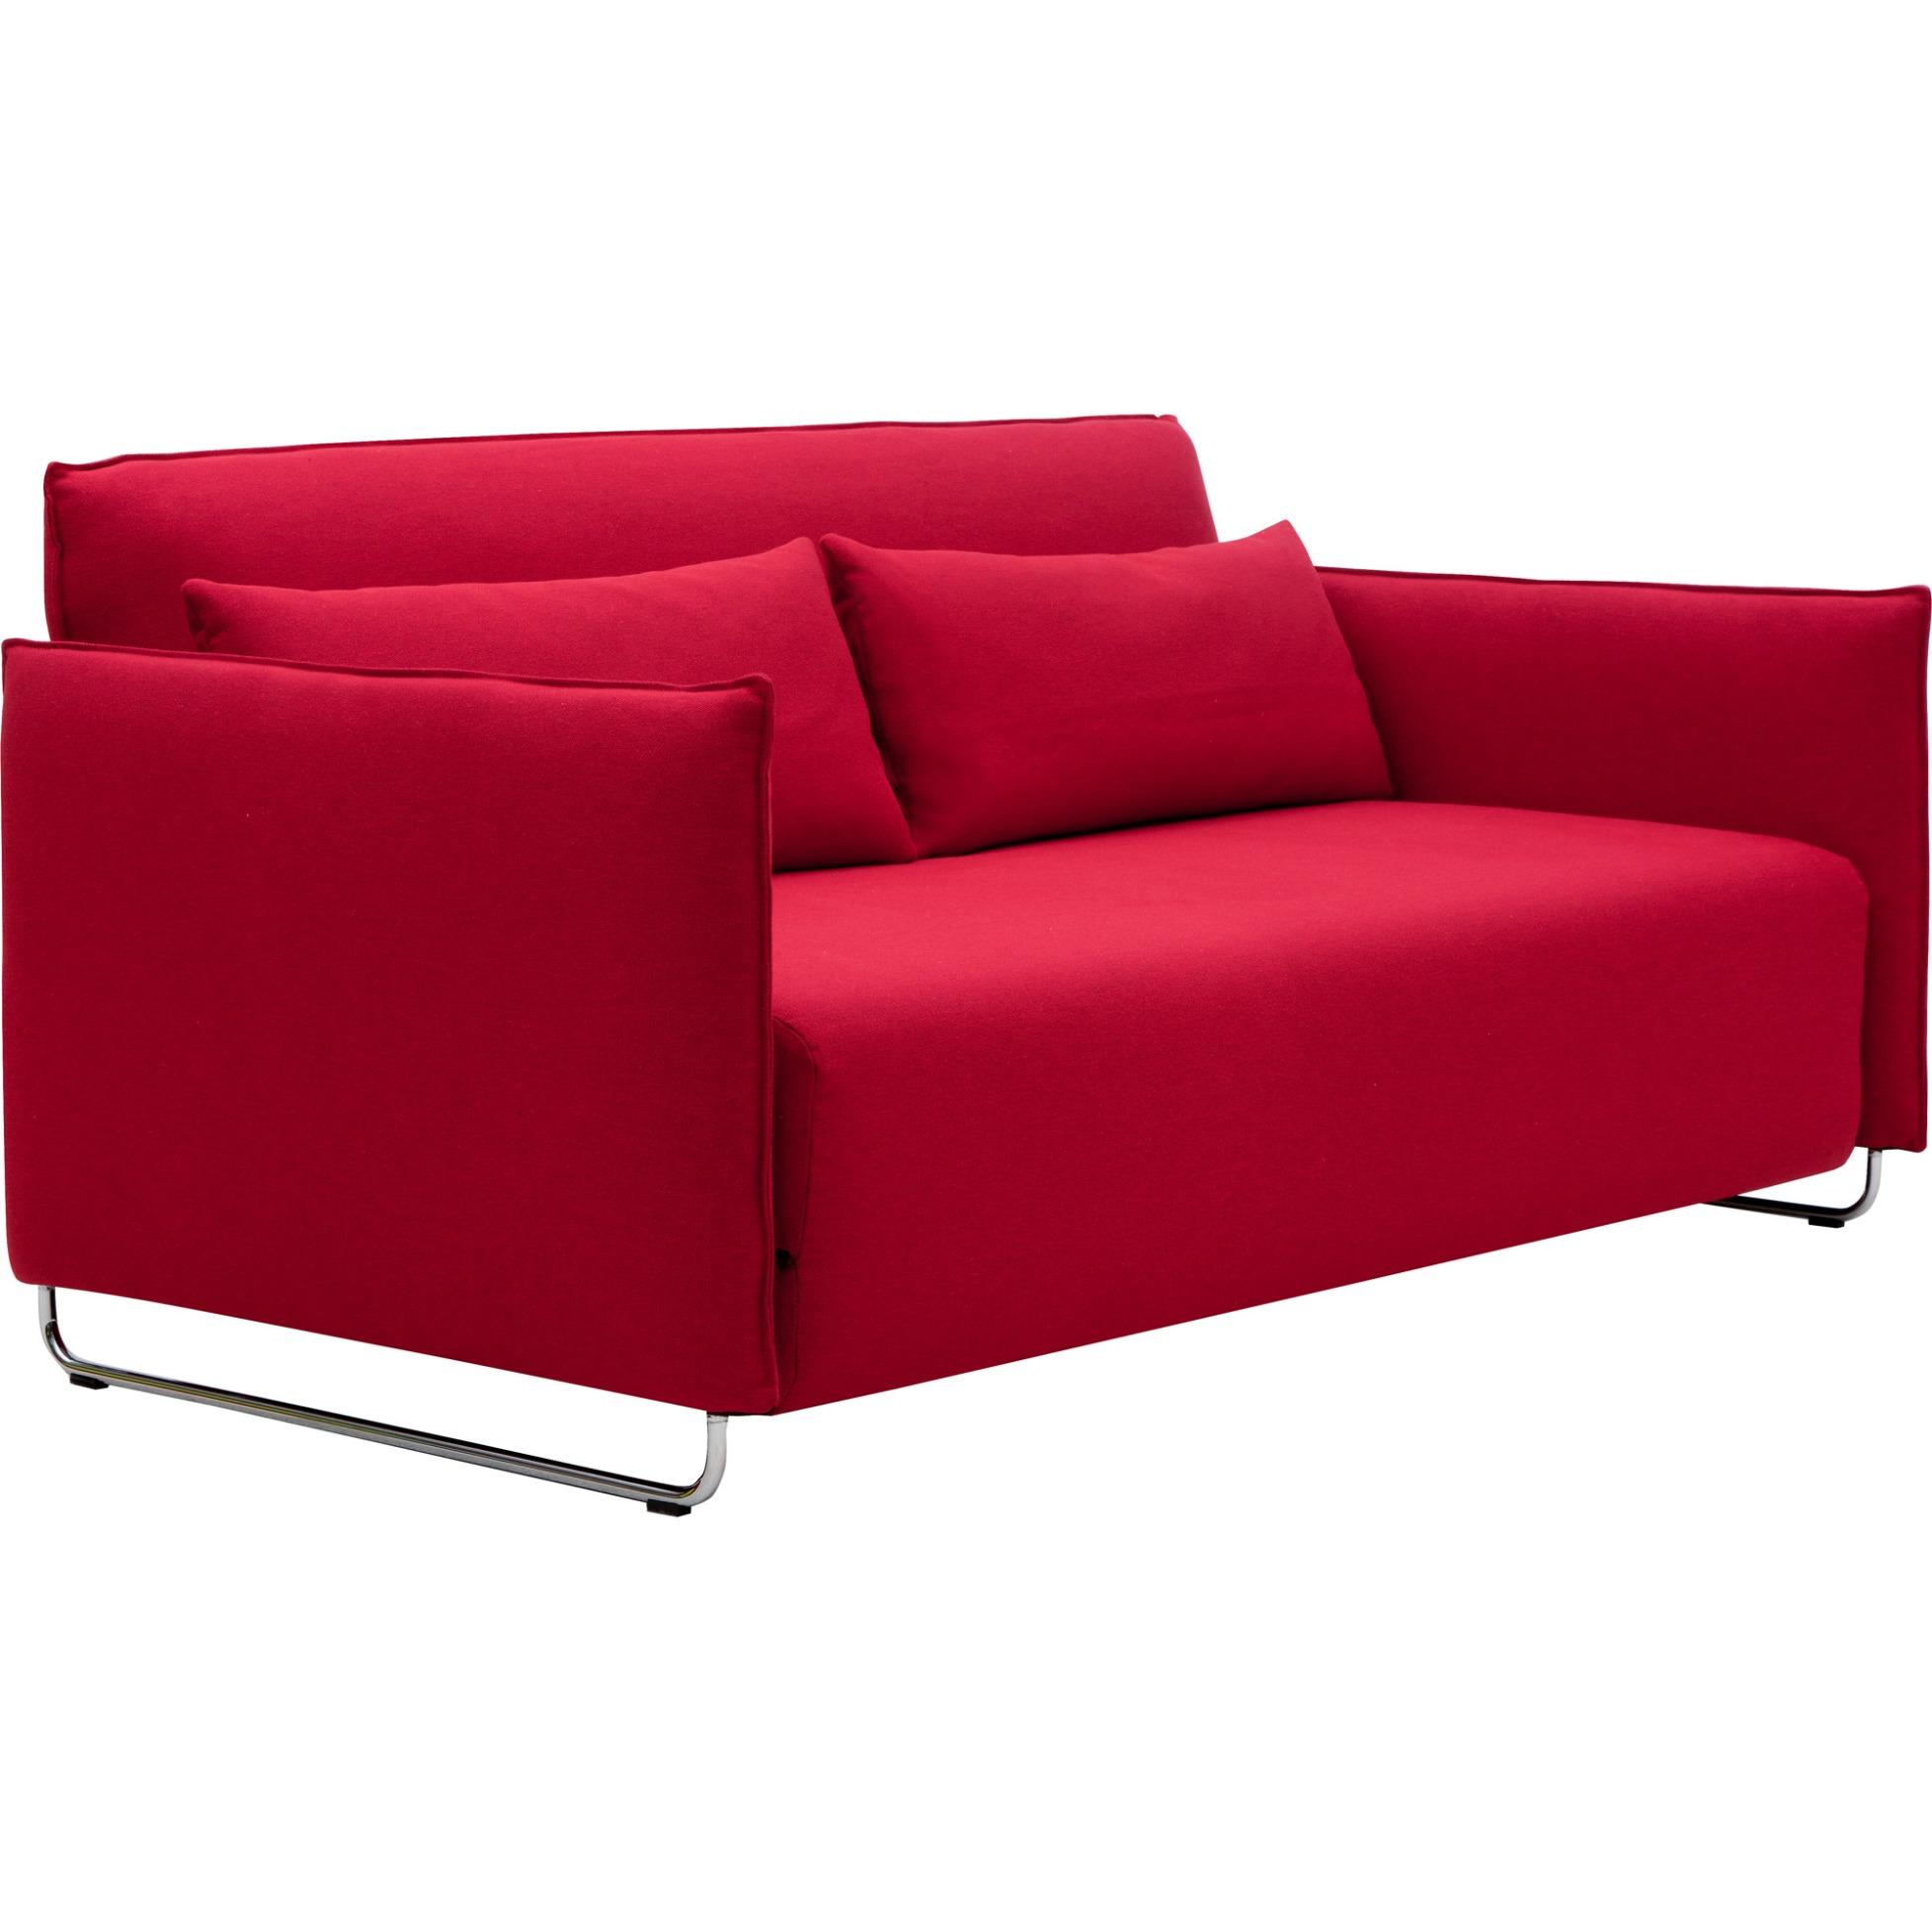 Schlafsofa cord von softline for Slaap stoel